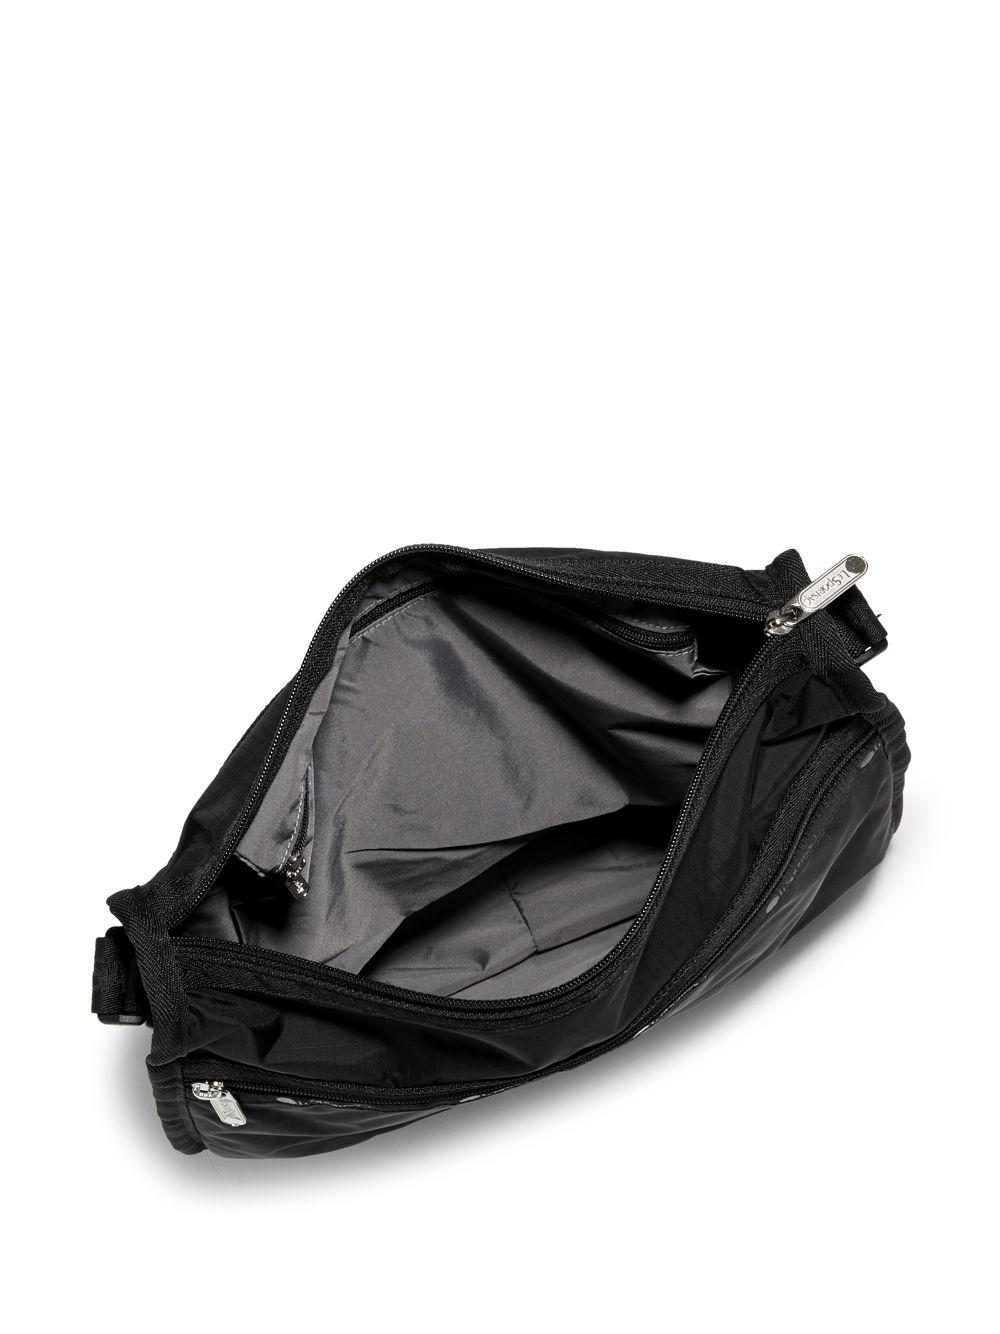 Lesportsac Black Nylon Messenger Bag Lyst View Fullscreen